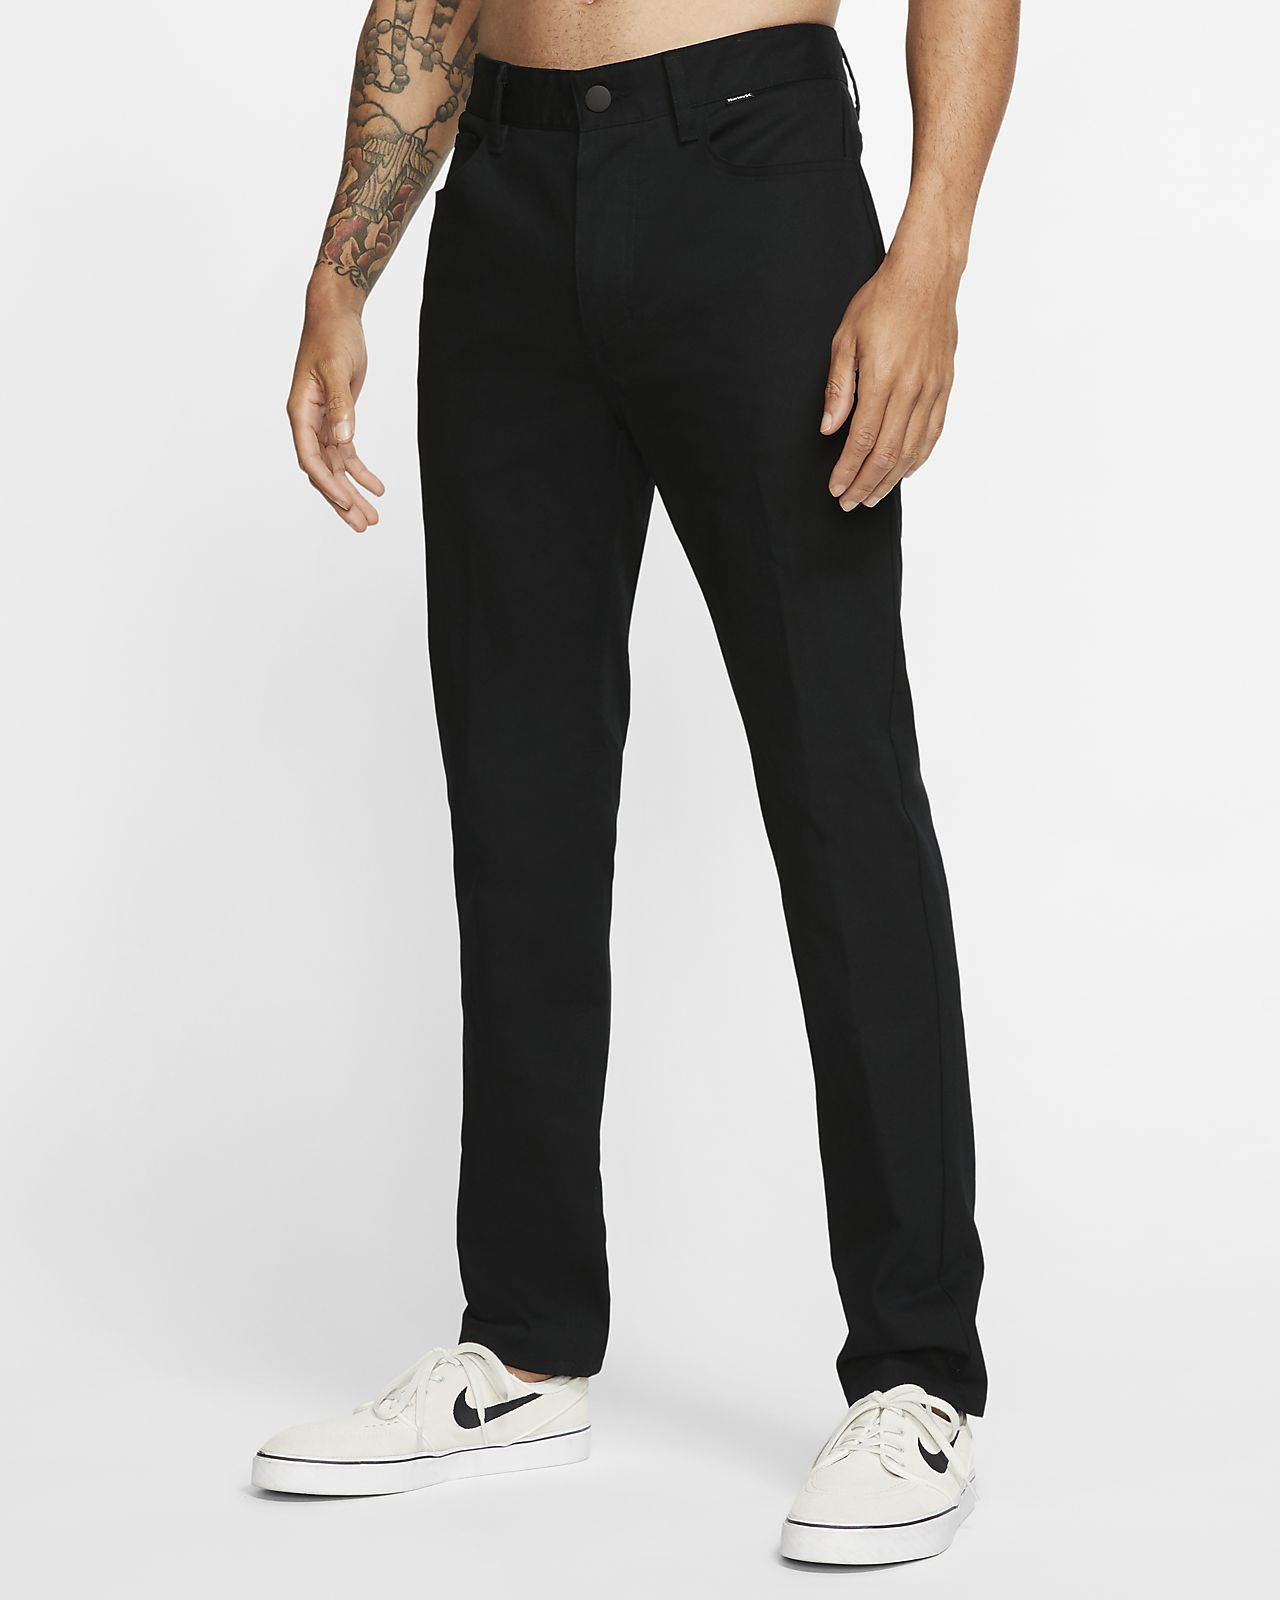 Hurley M 84 Storm Cotton™ Pantalón - Hombre